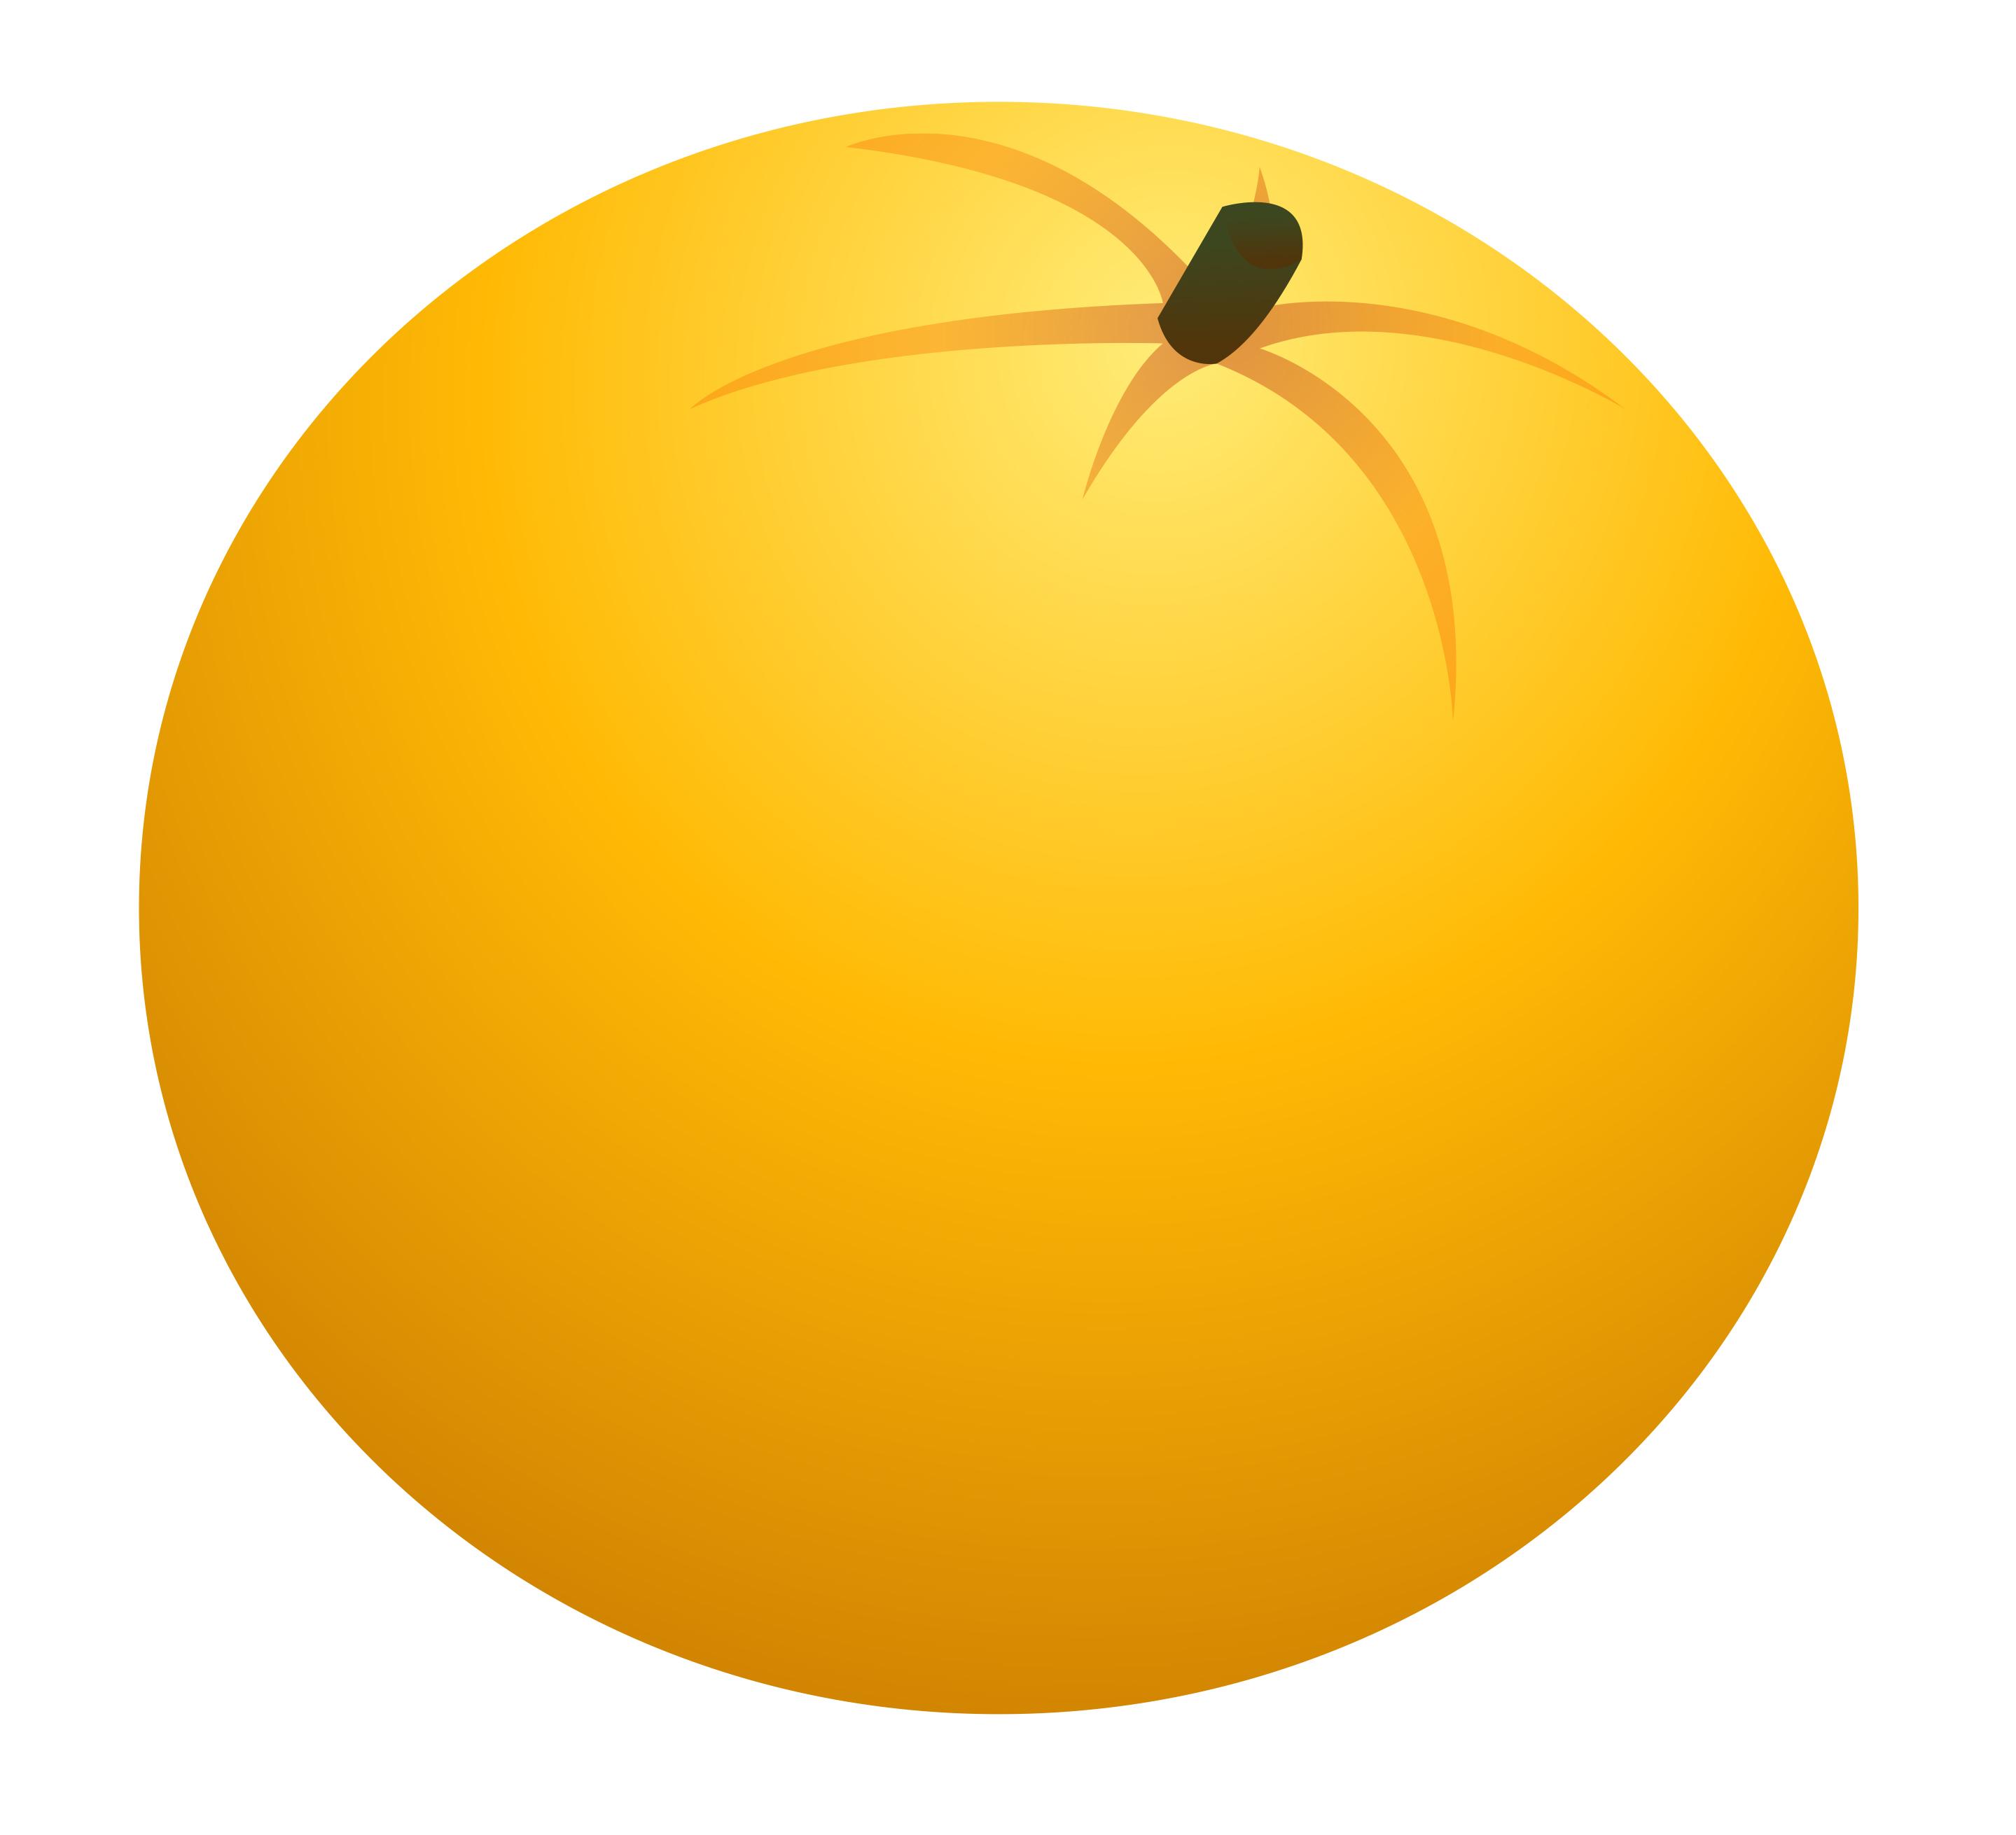 Clipart grapefruit.